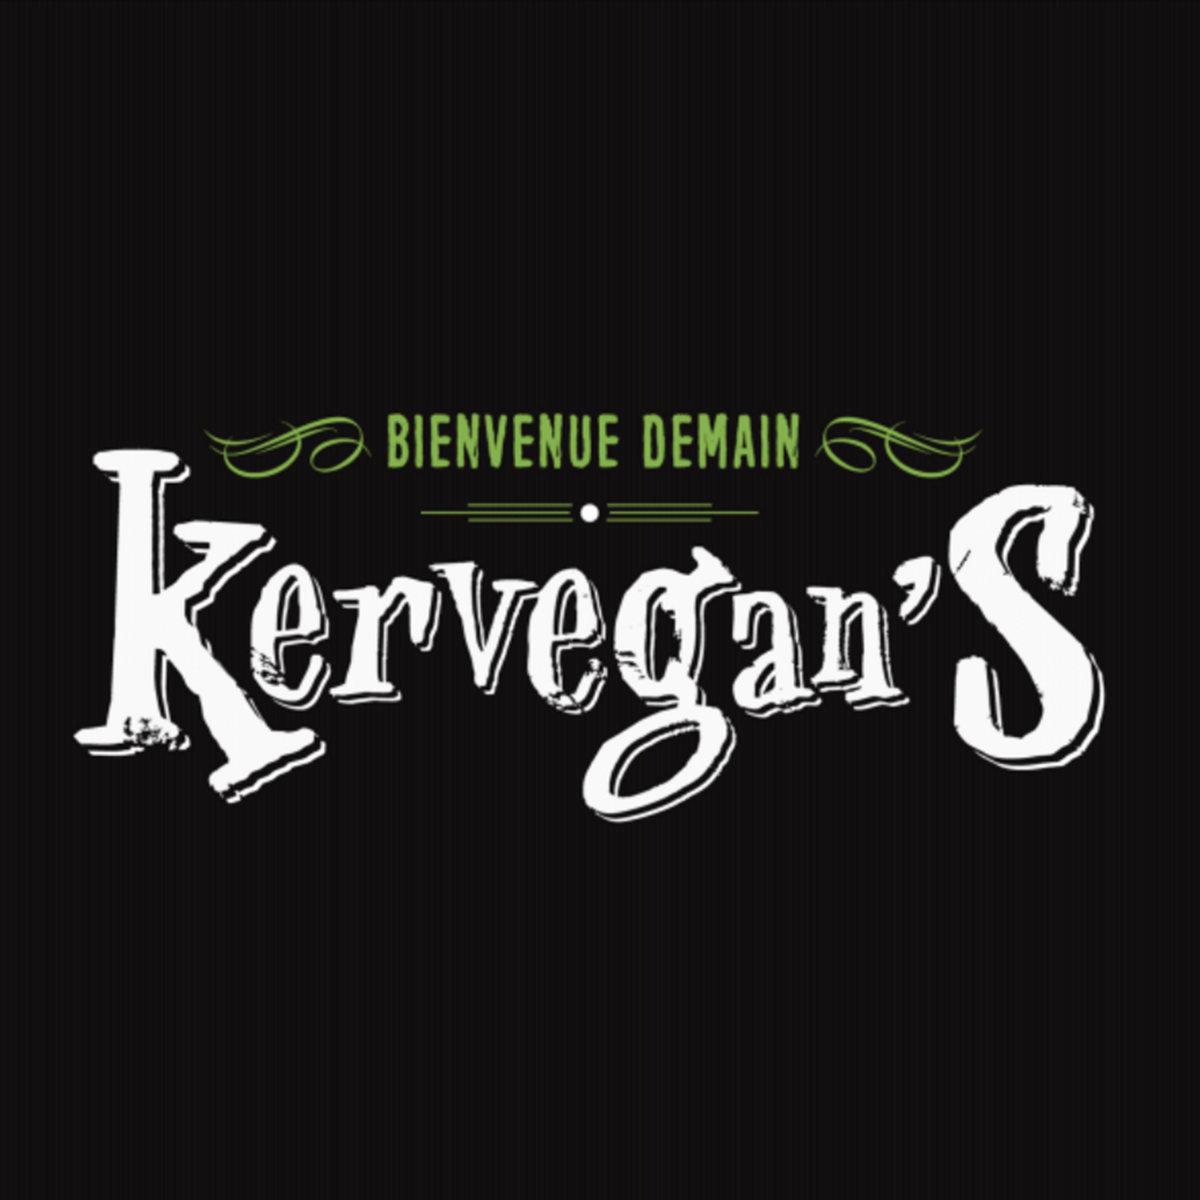 Bienvenue Demain | Kervegans